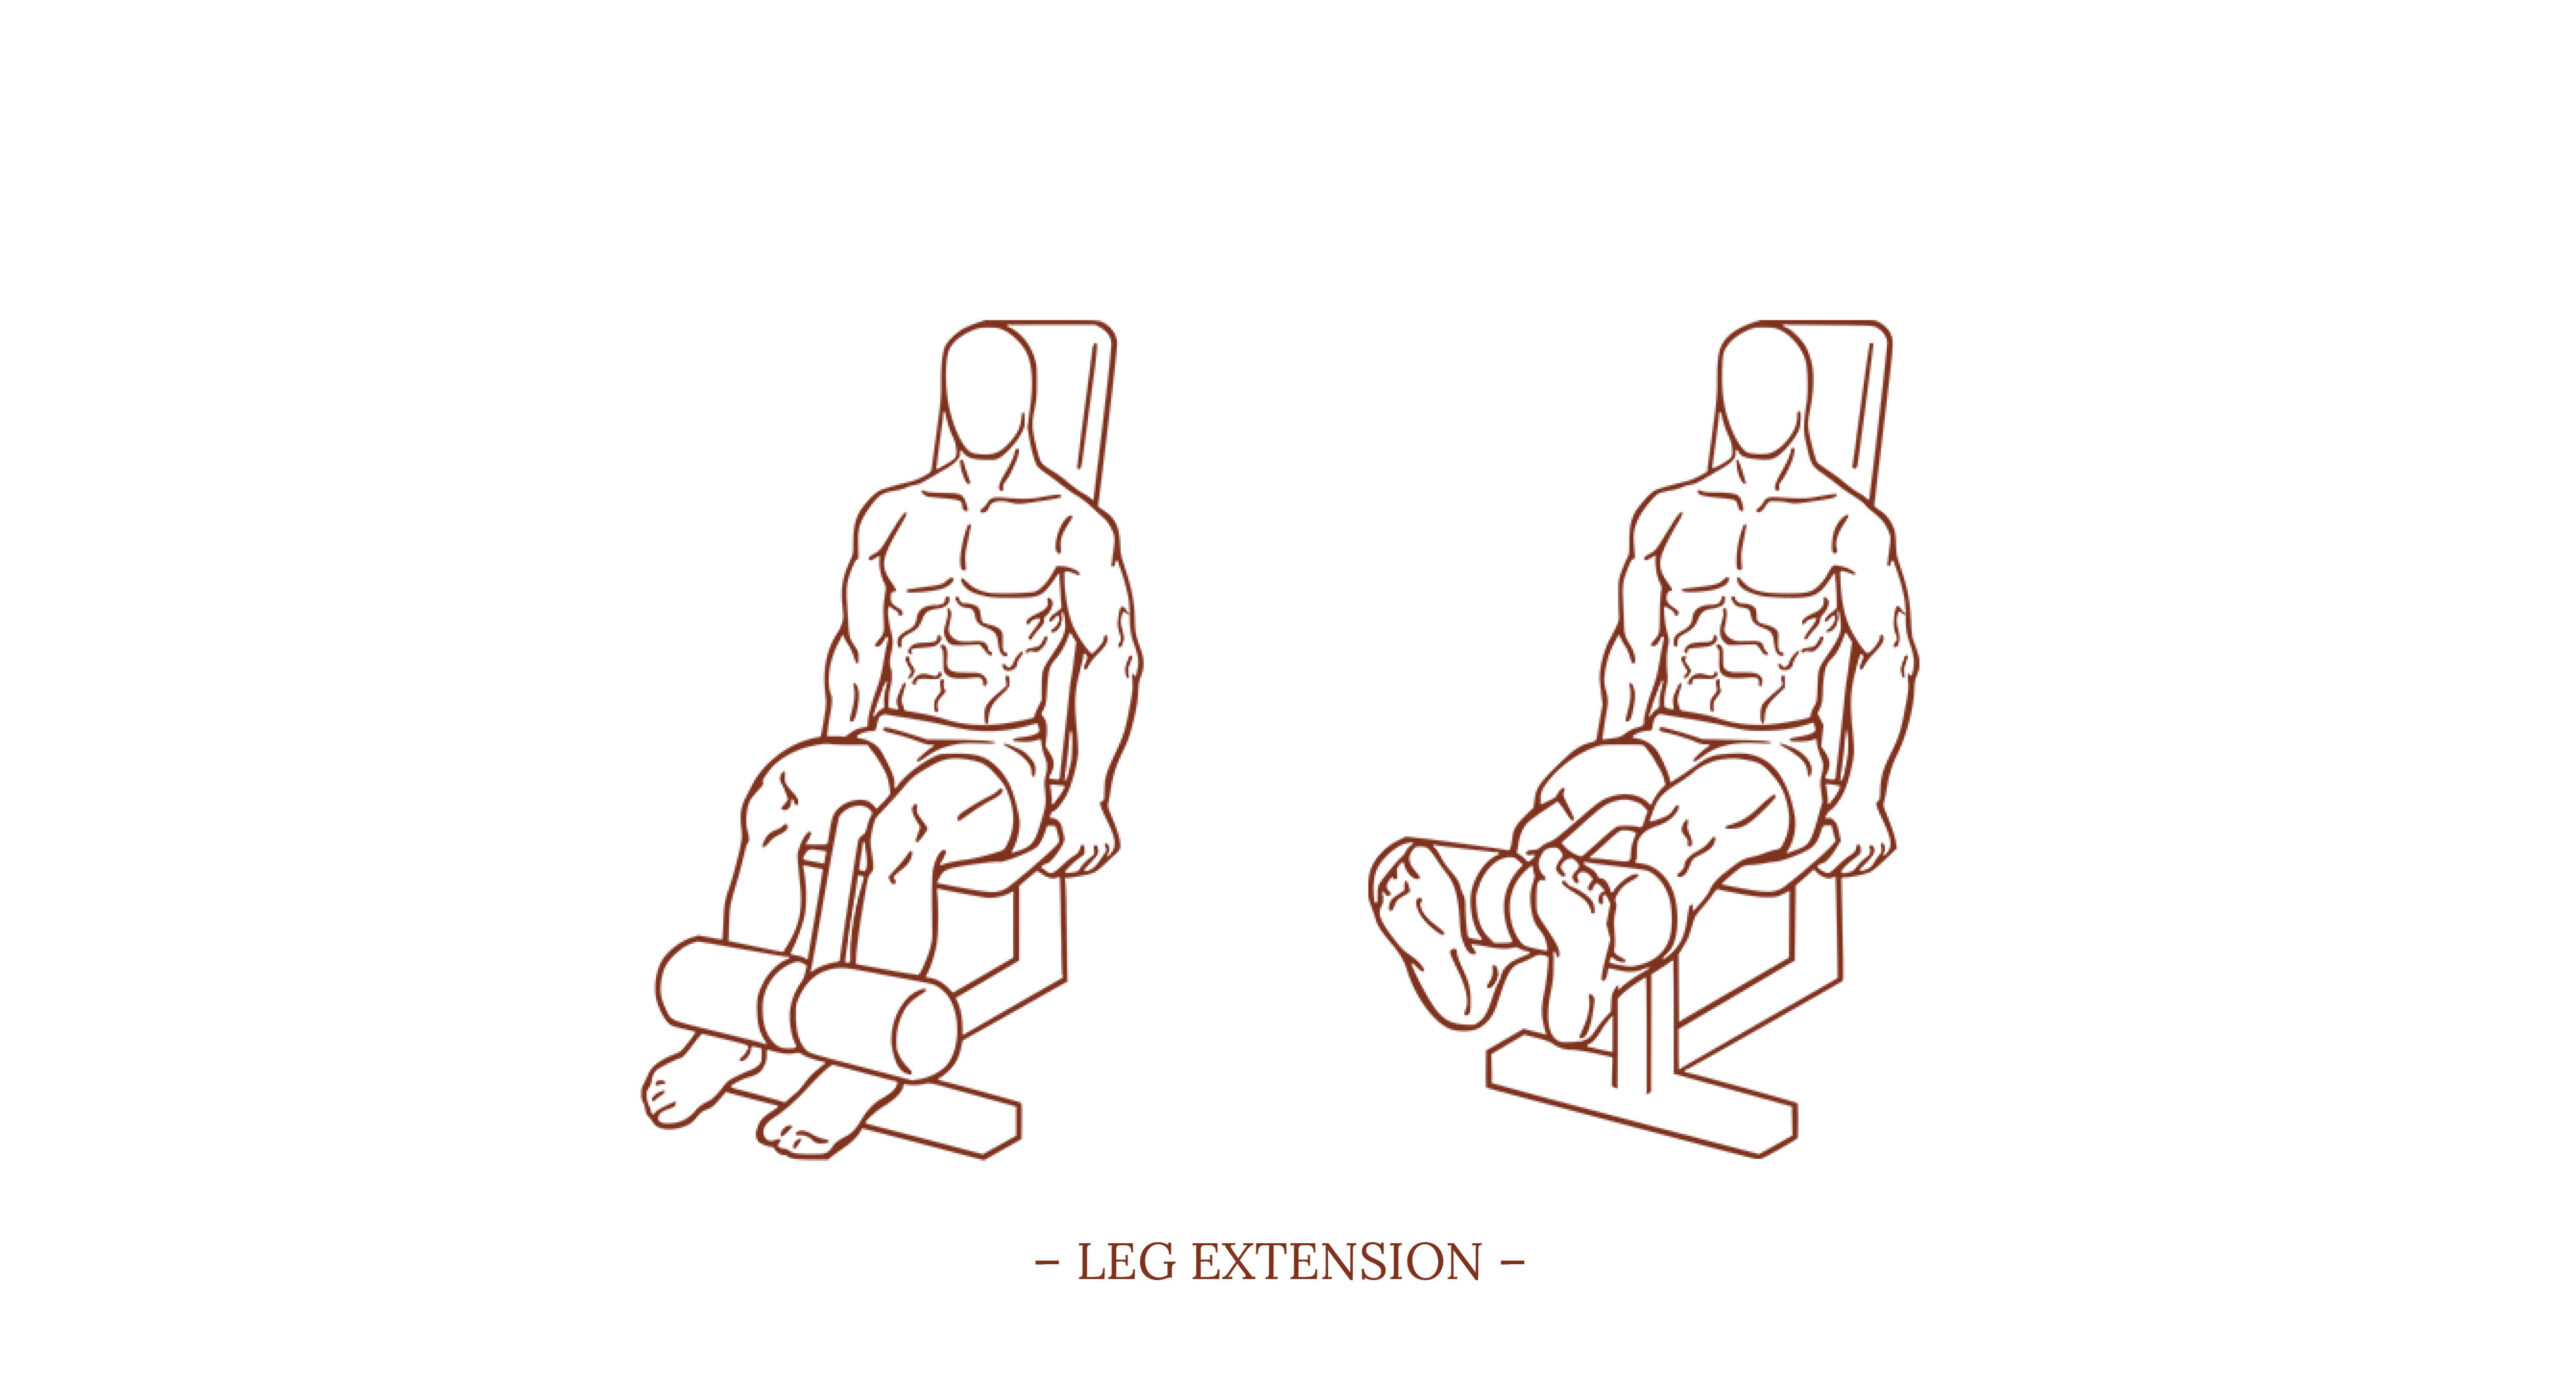 Leg Extension Illustration